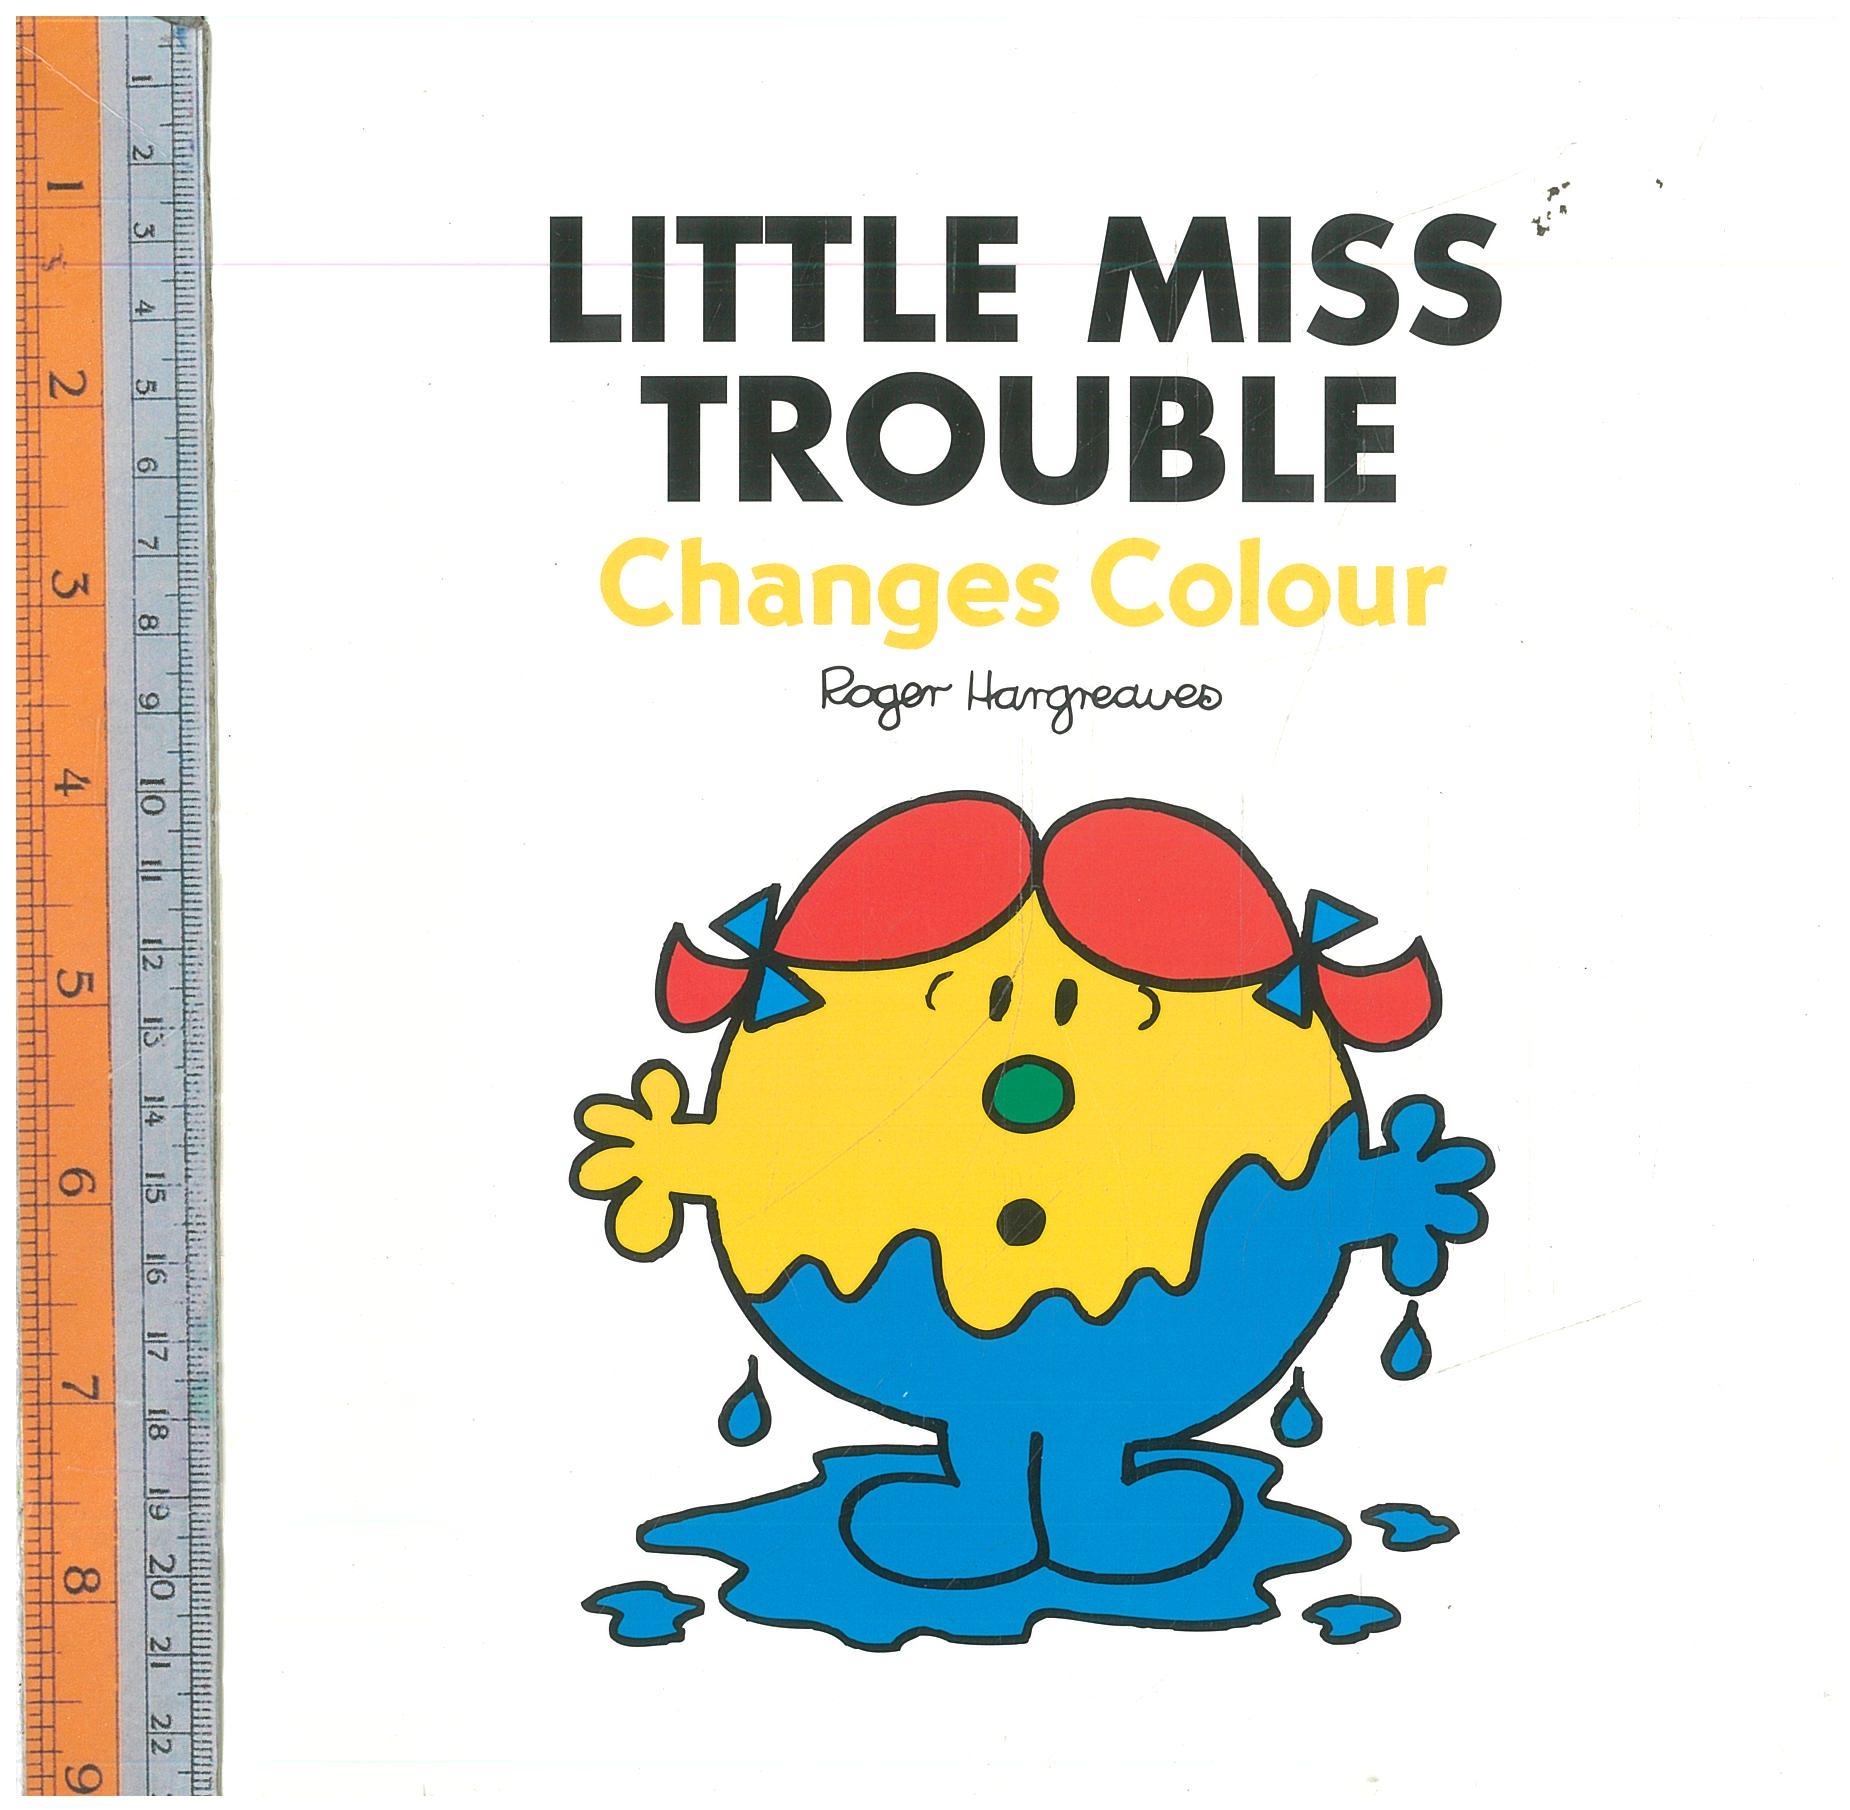 Little misss trouble